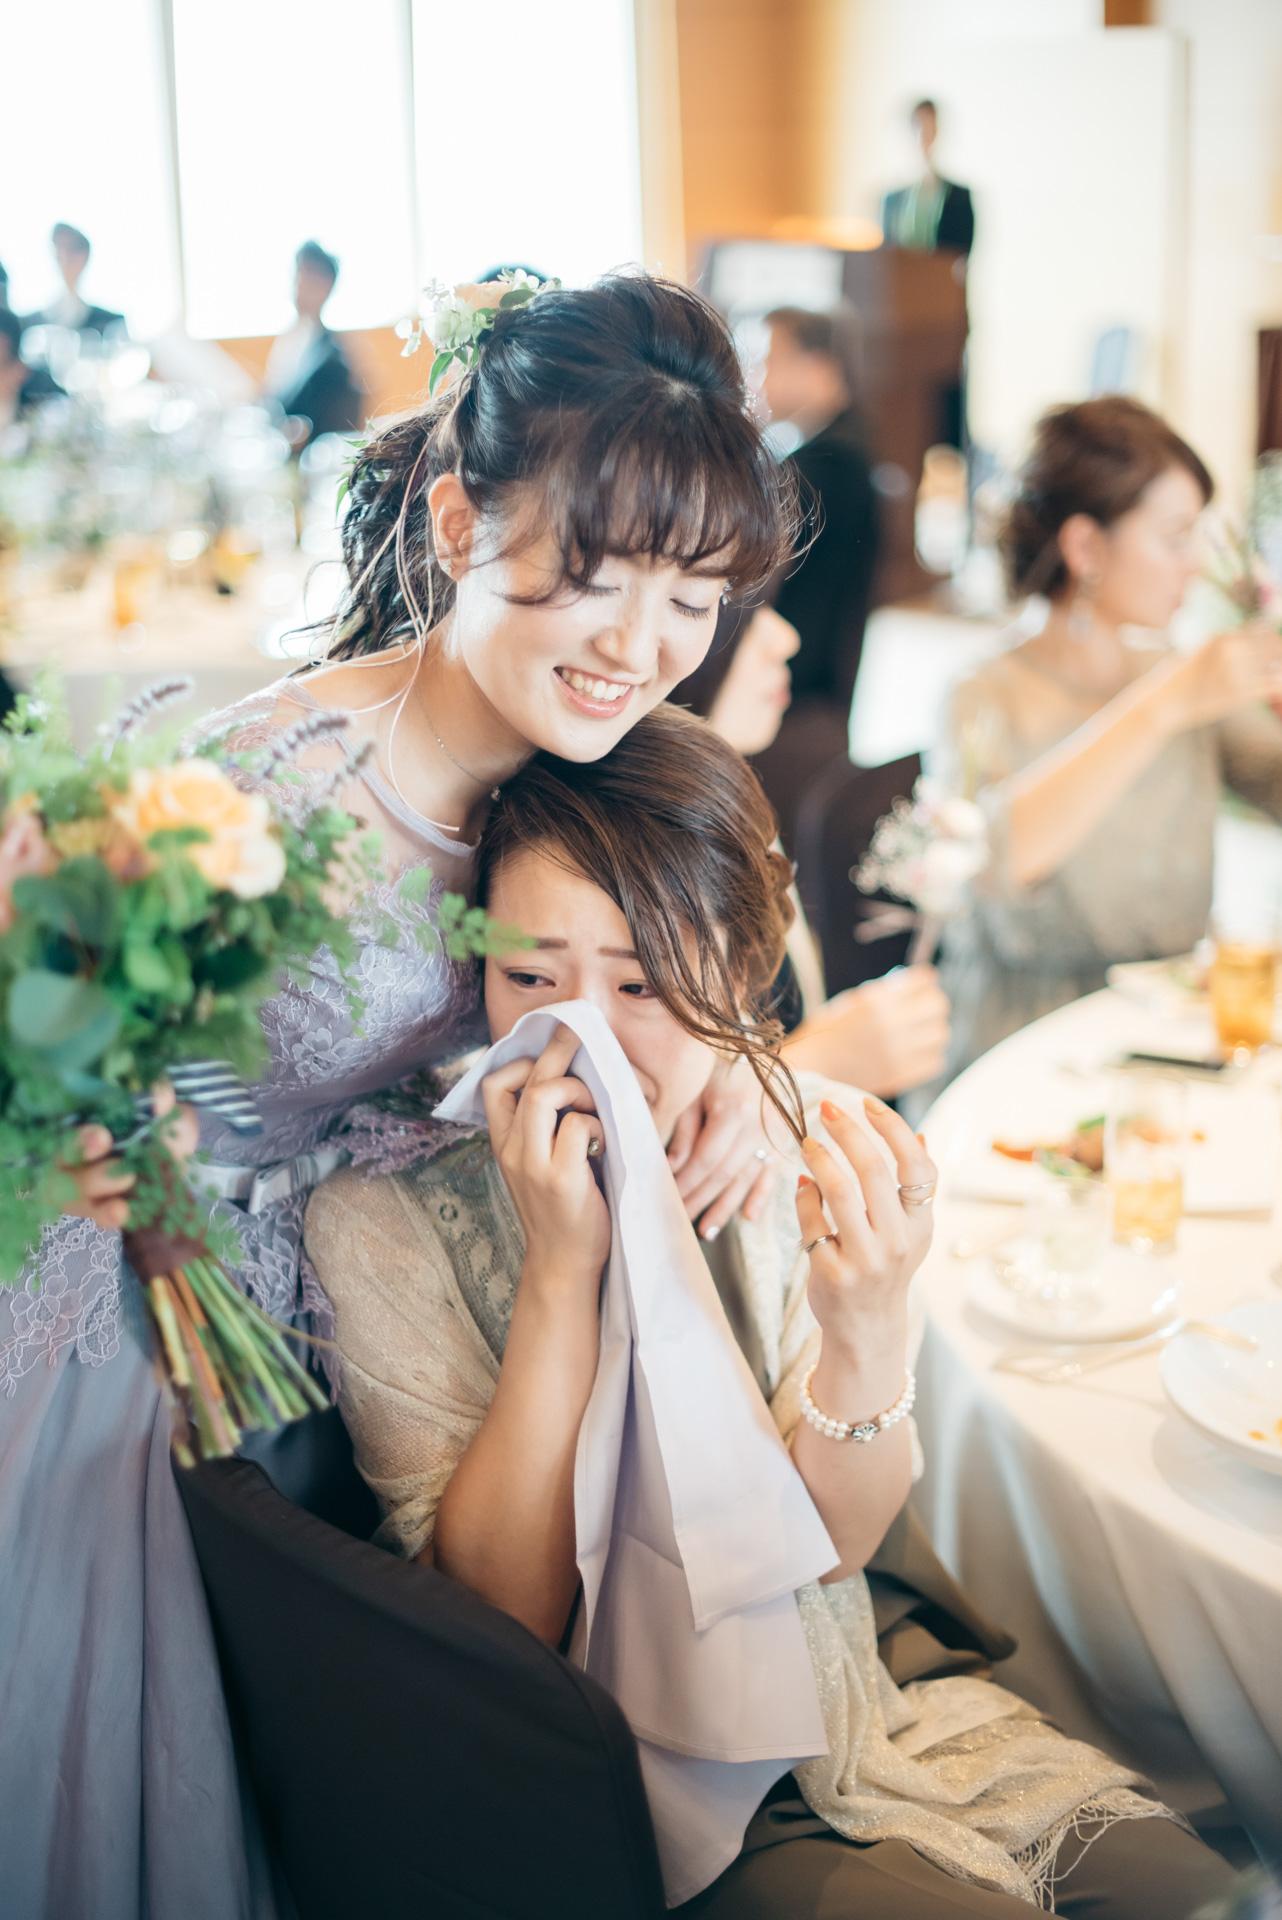 Fika and Fotos  結婚式 カメラマン 持ち込みカメラマン ウェディングフォトグラファー